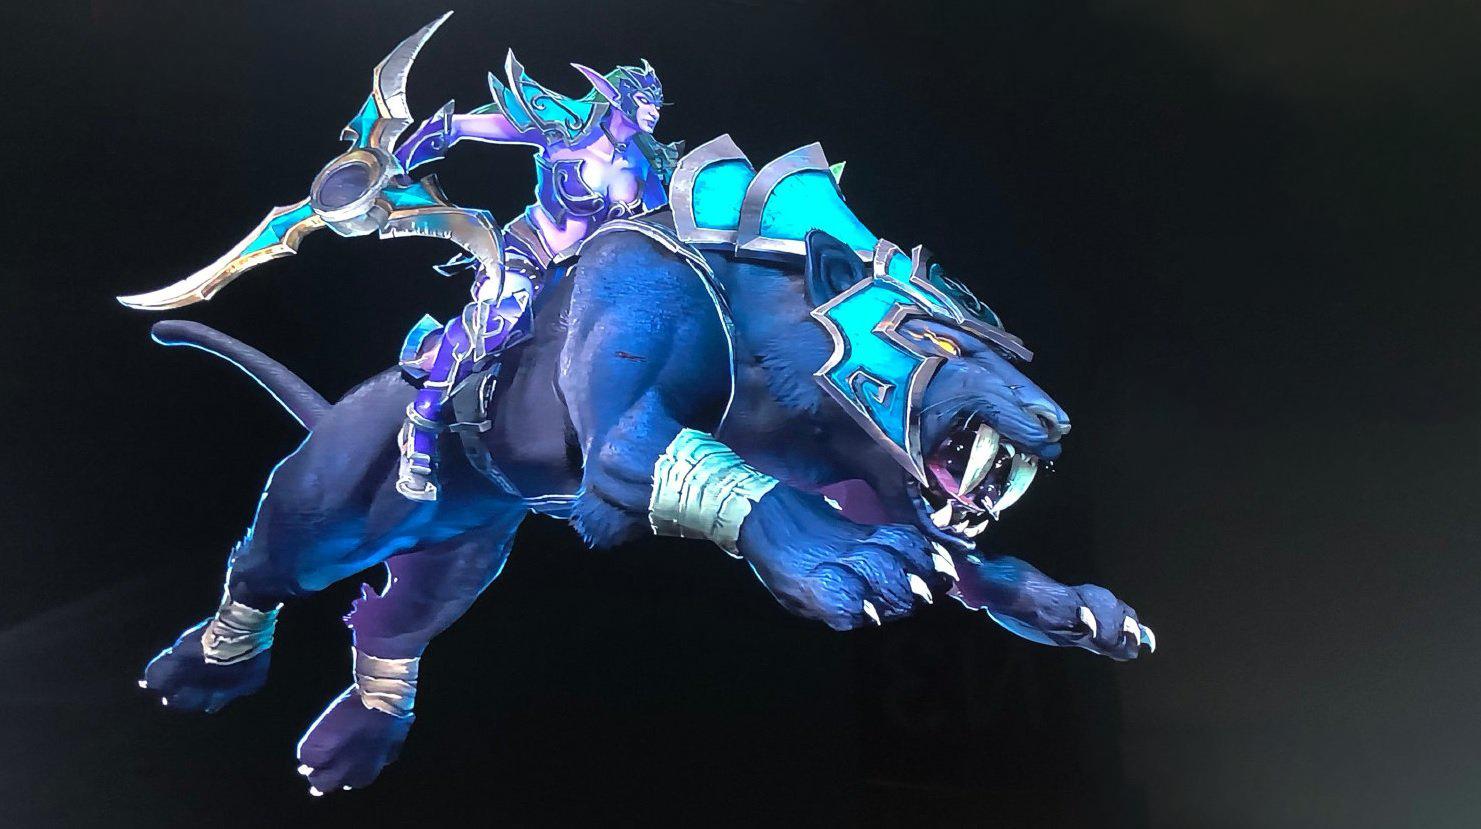 Huntress Warcraft 3 Reforged